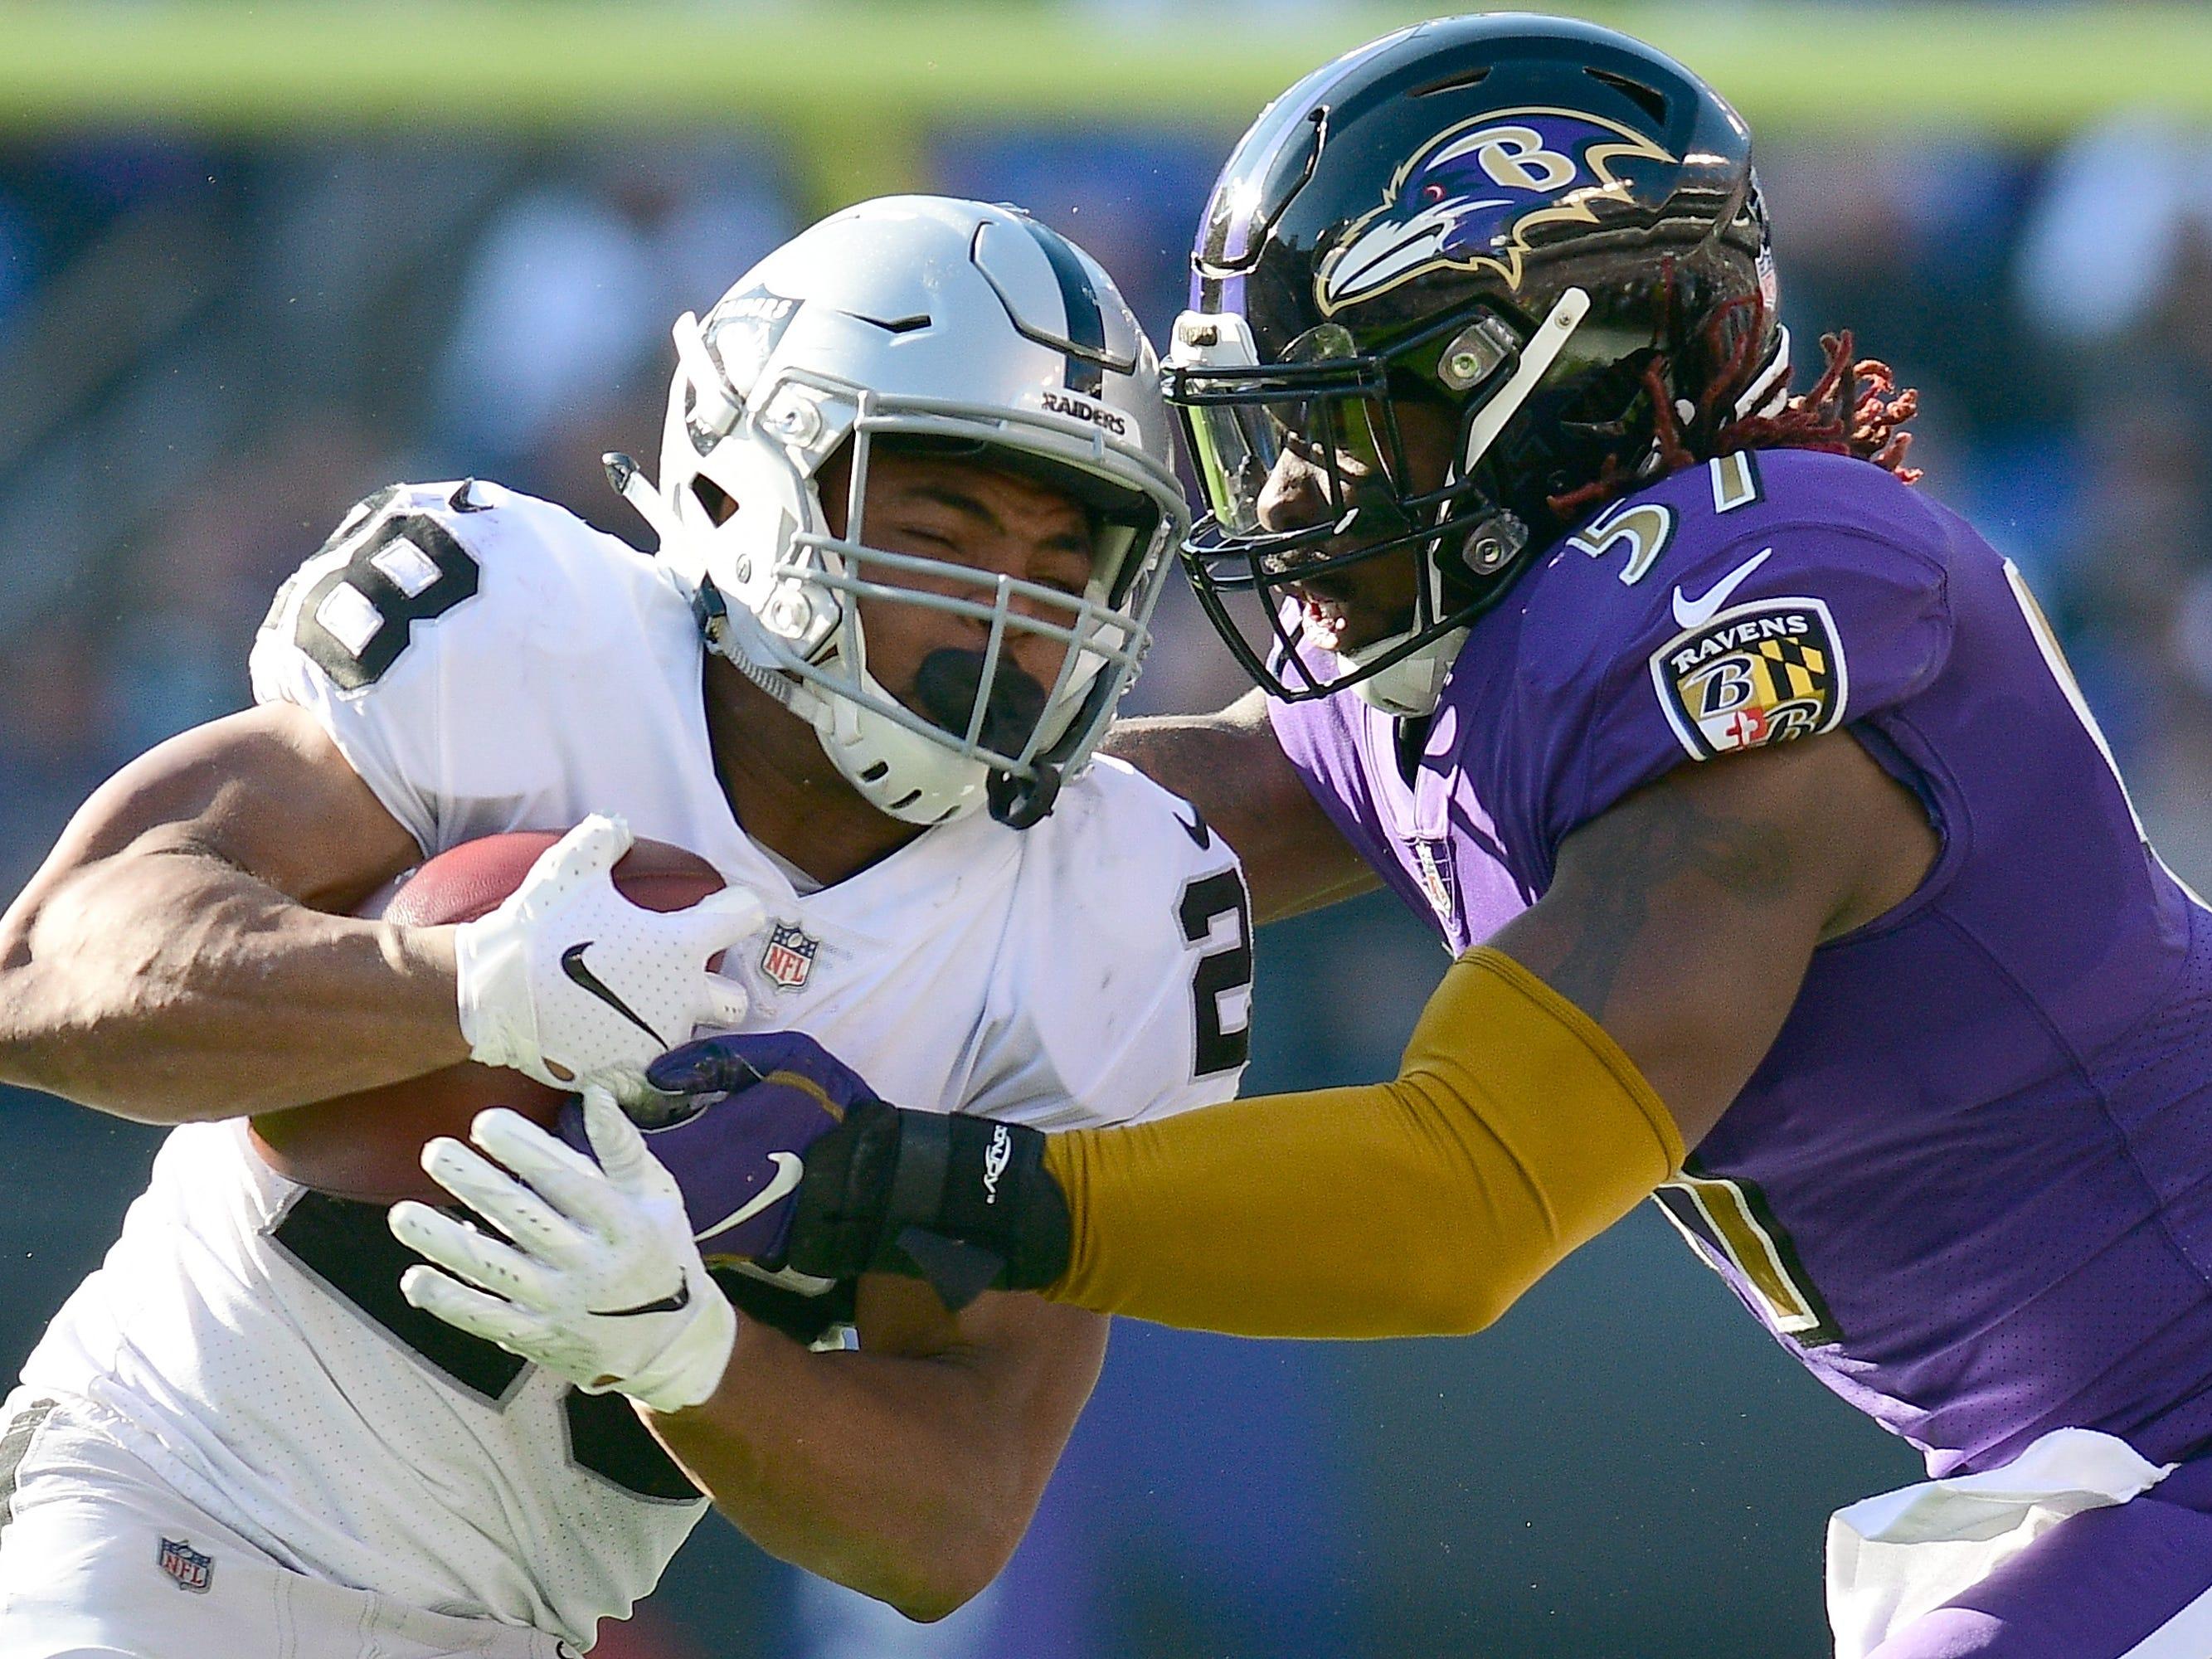 ILB - C.J. Mosley, Baltimore Ravens